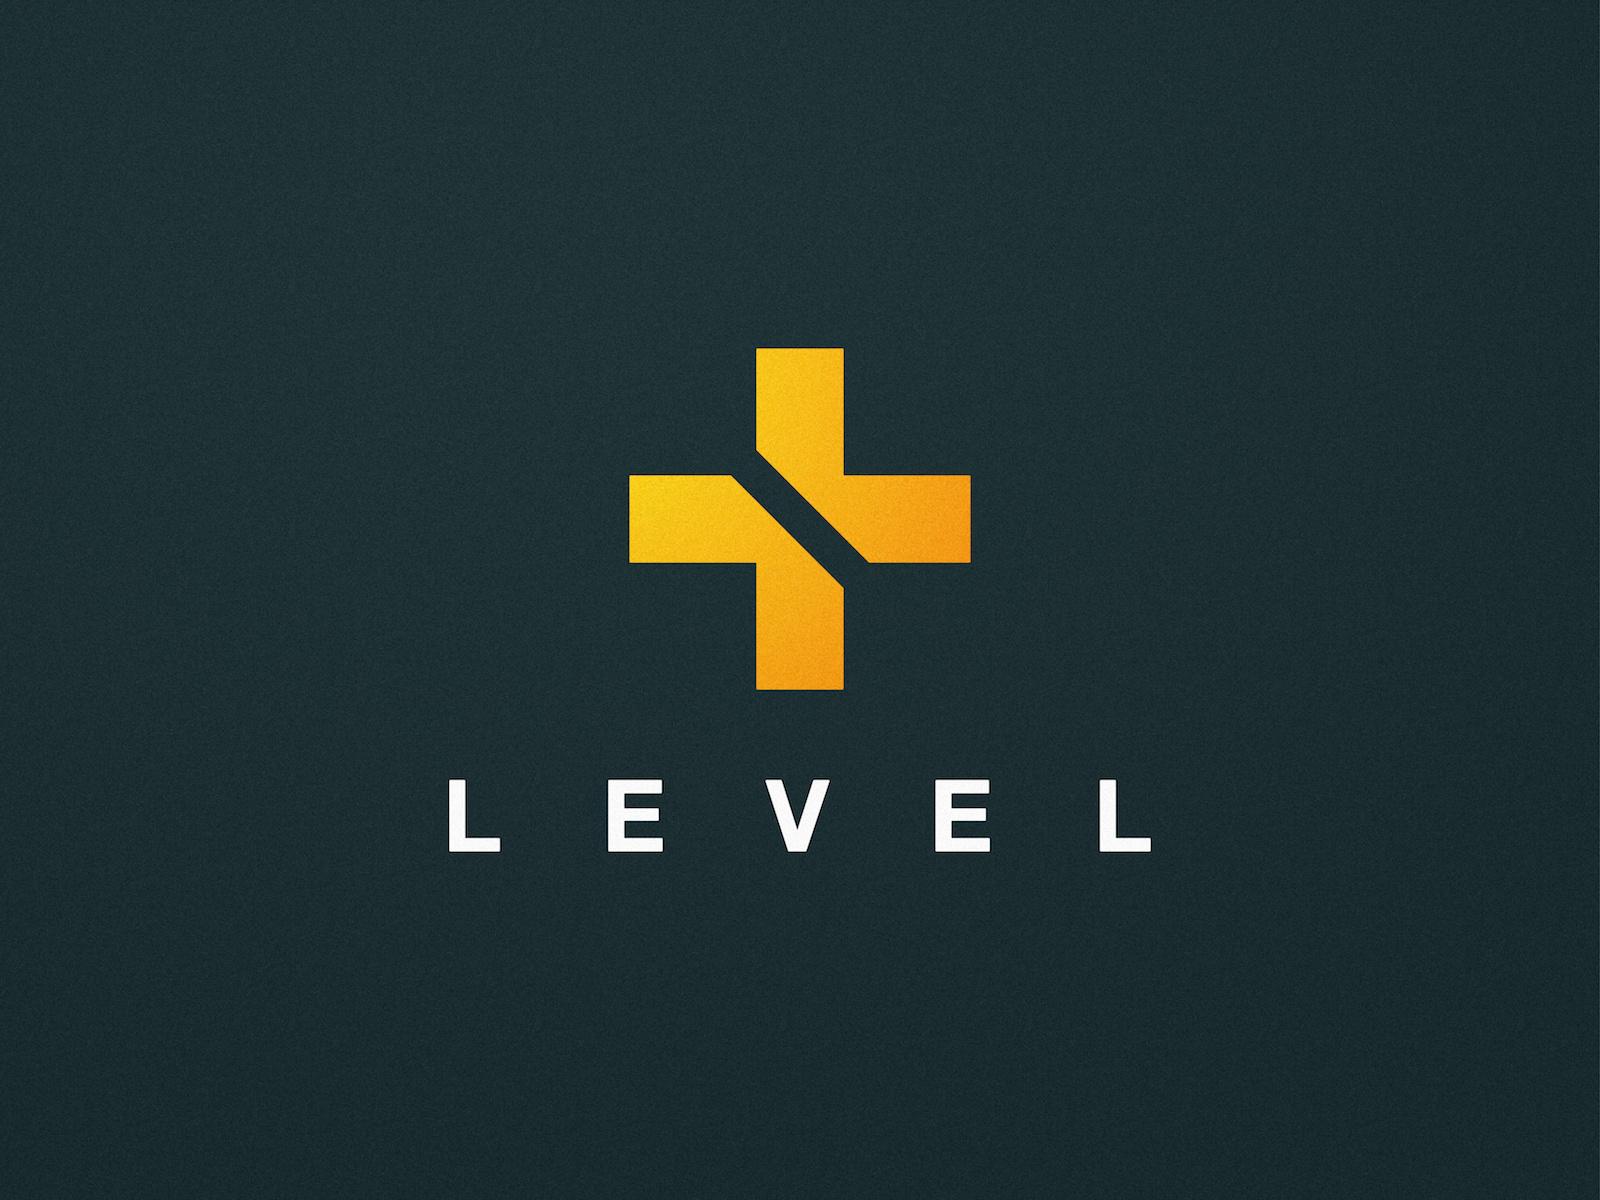 Level drib2 01